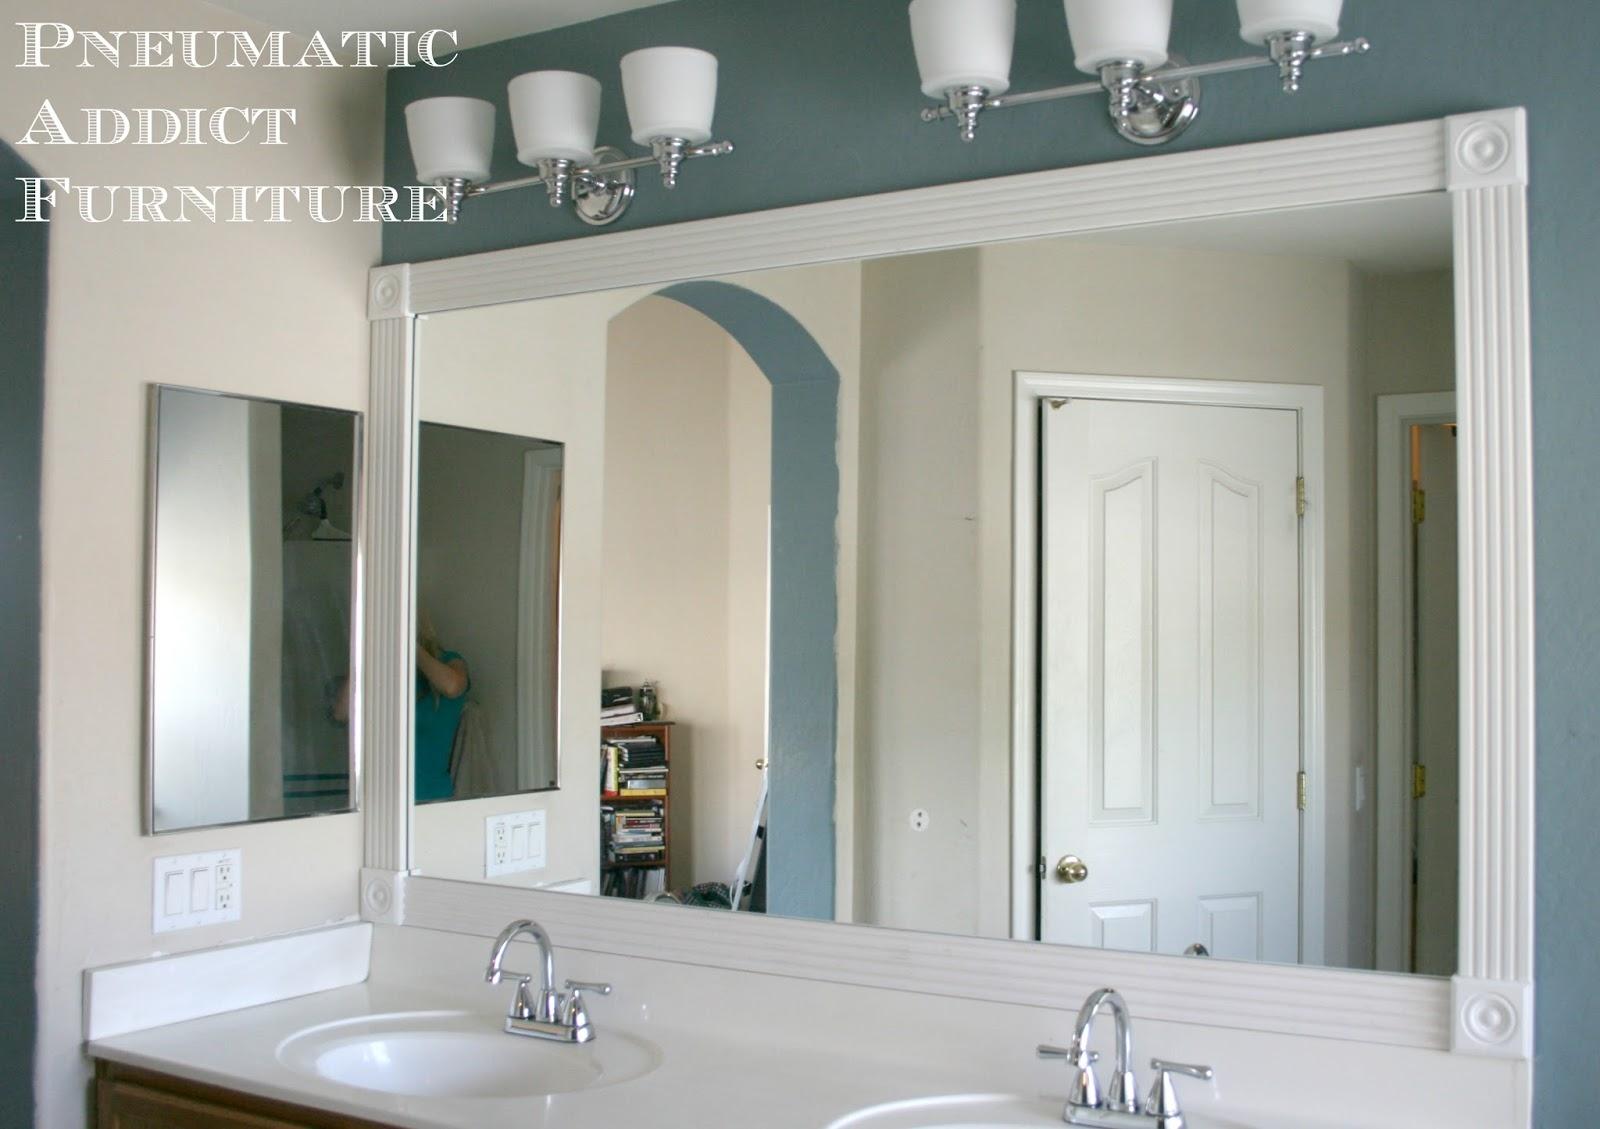 Add Molding Around Bathroom Mirror